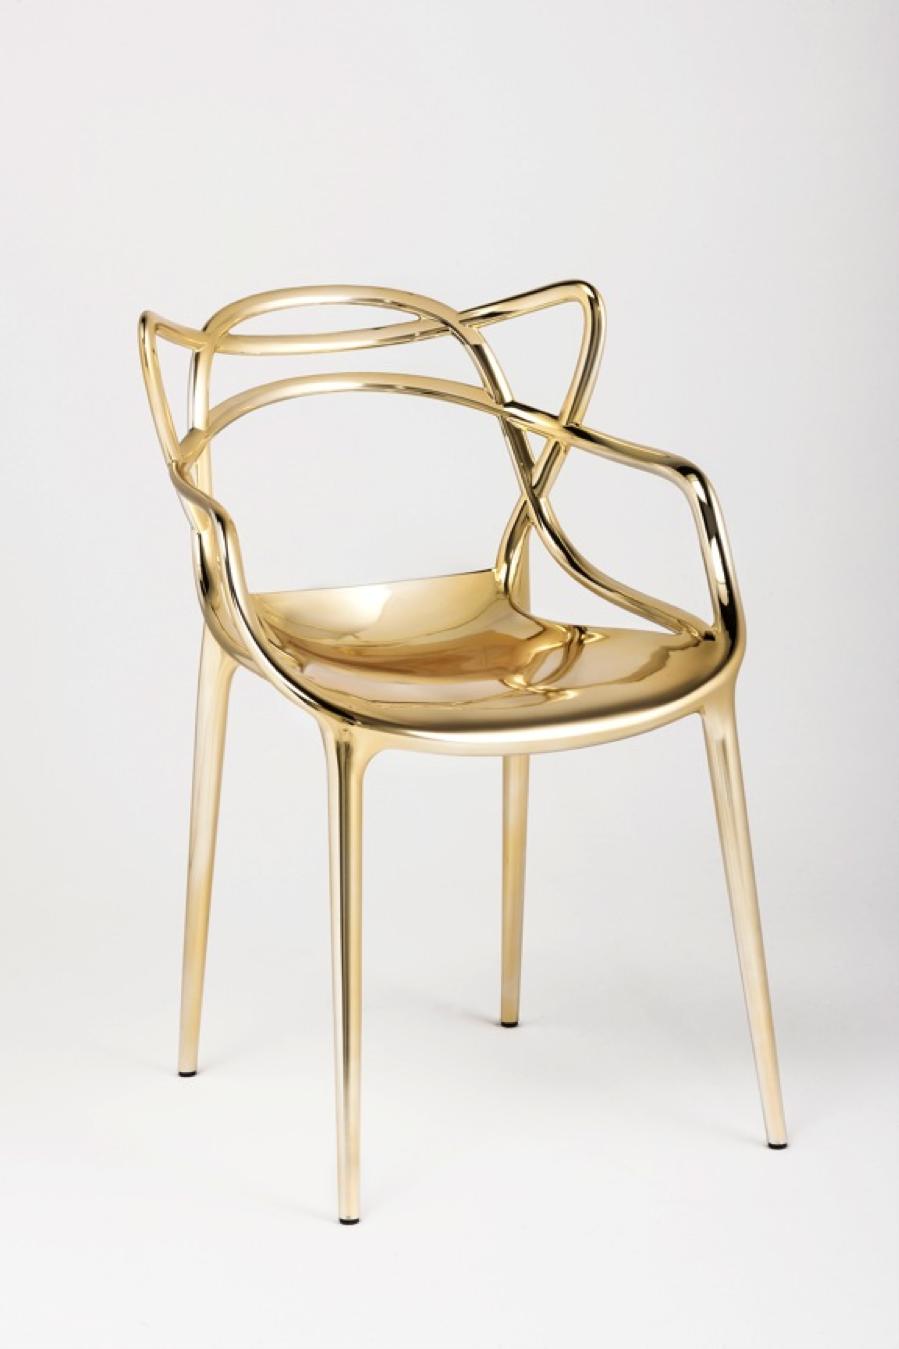 Philippe Starck Design Stoelen.Kartell Master Chair By Philippe Starck A Hybrid Of Three